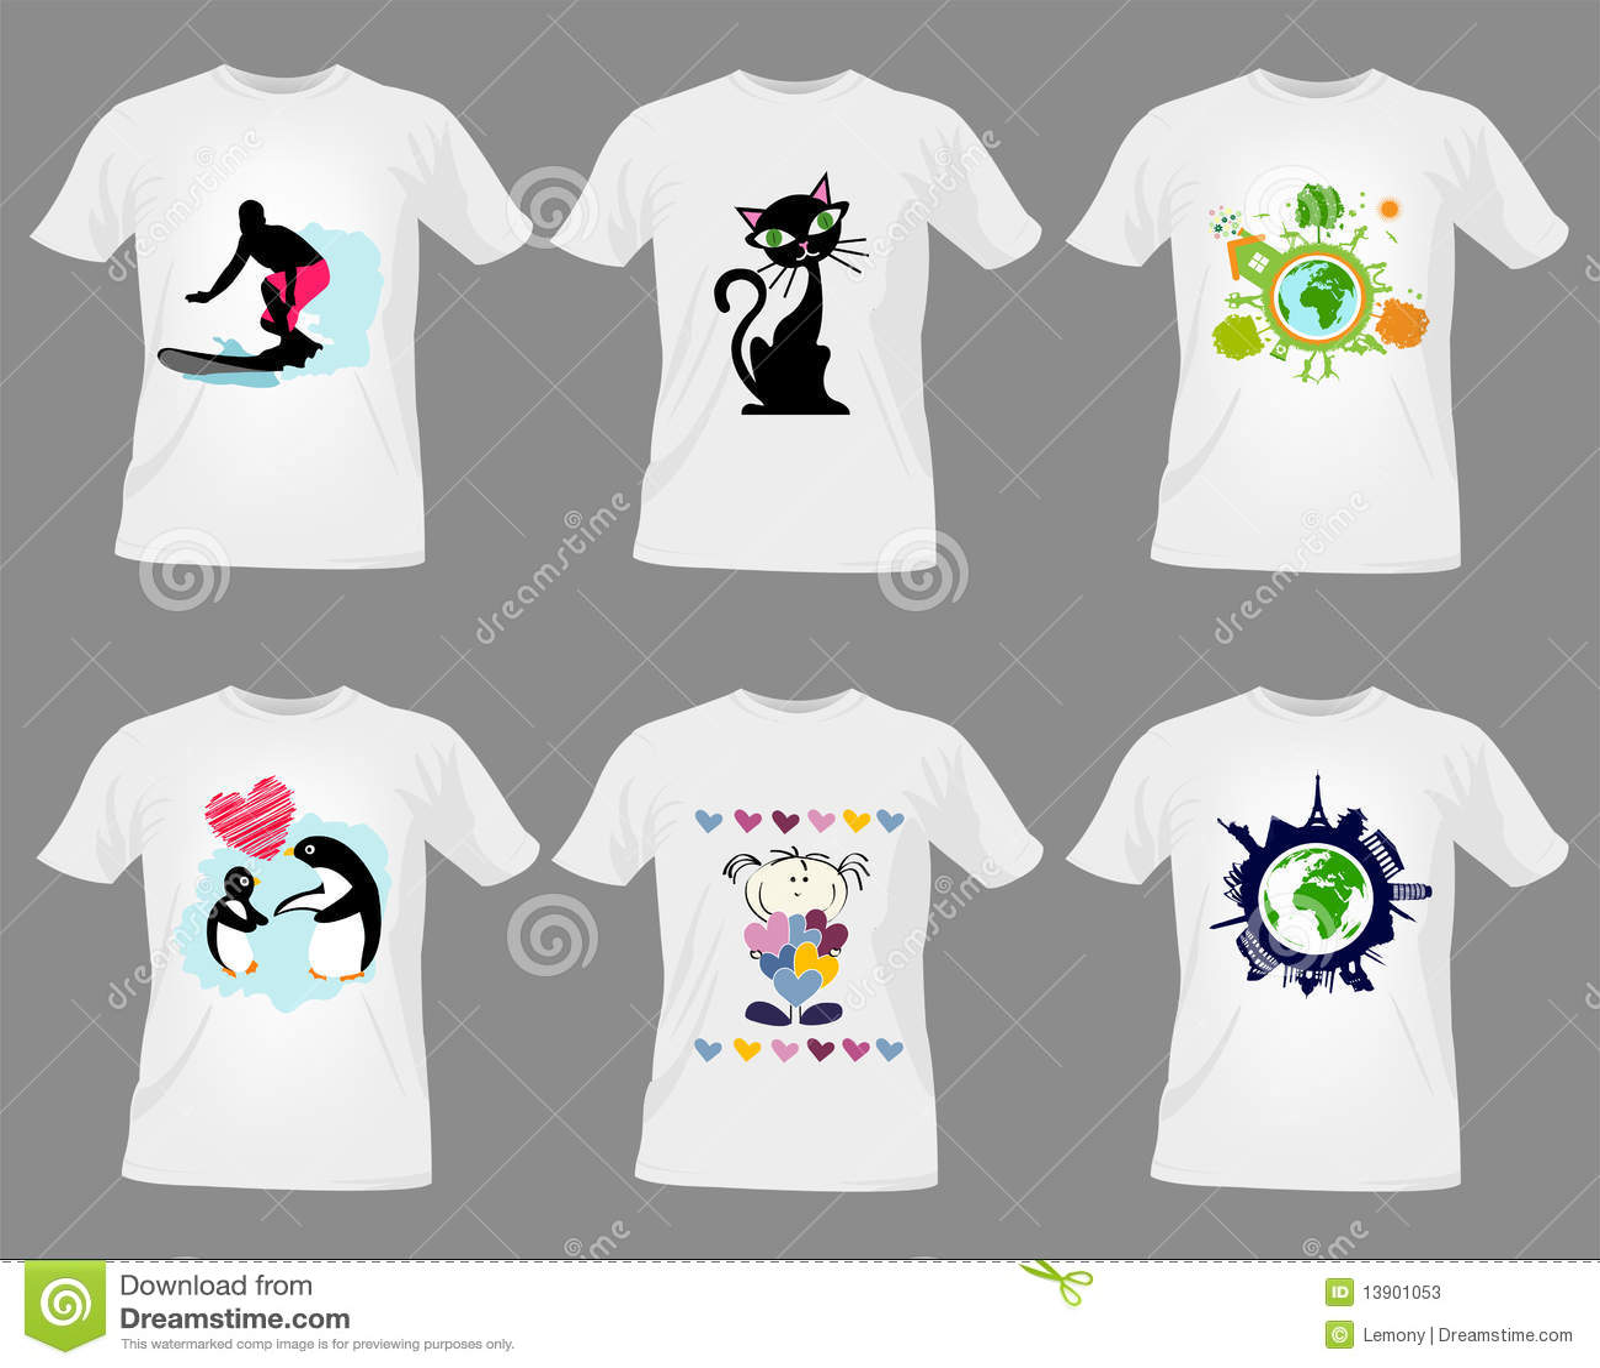 Трафарет для футболки